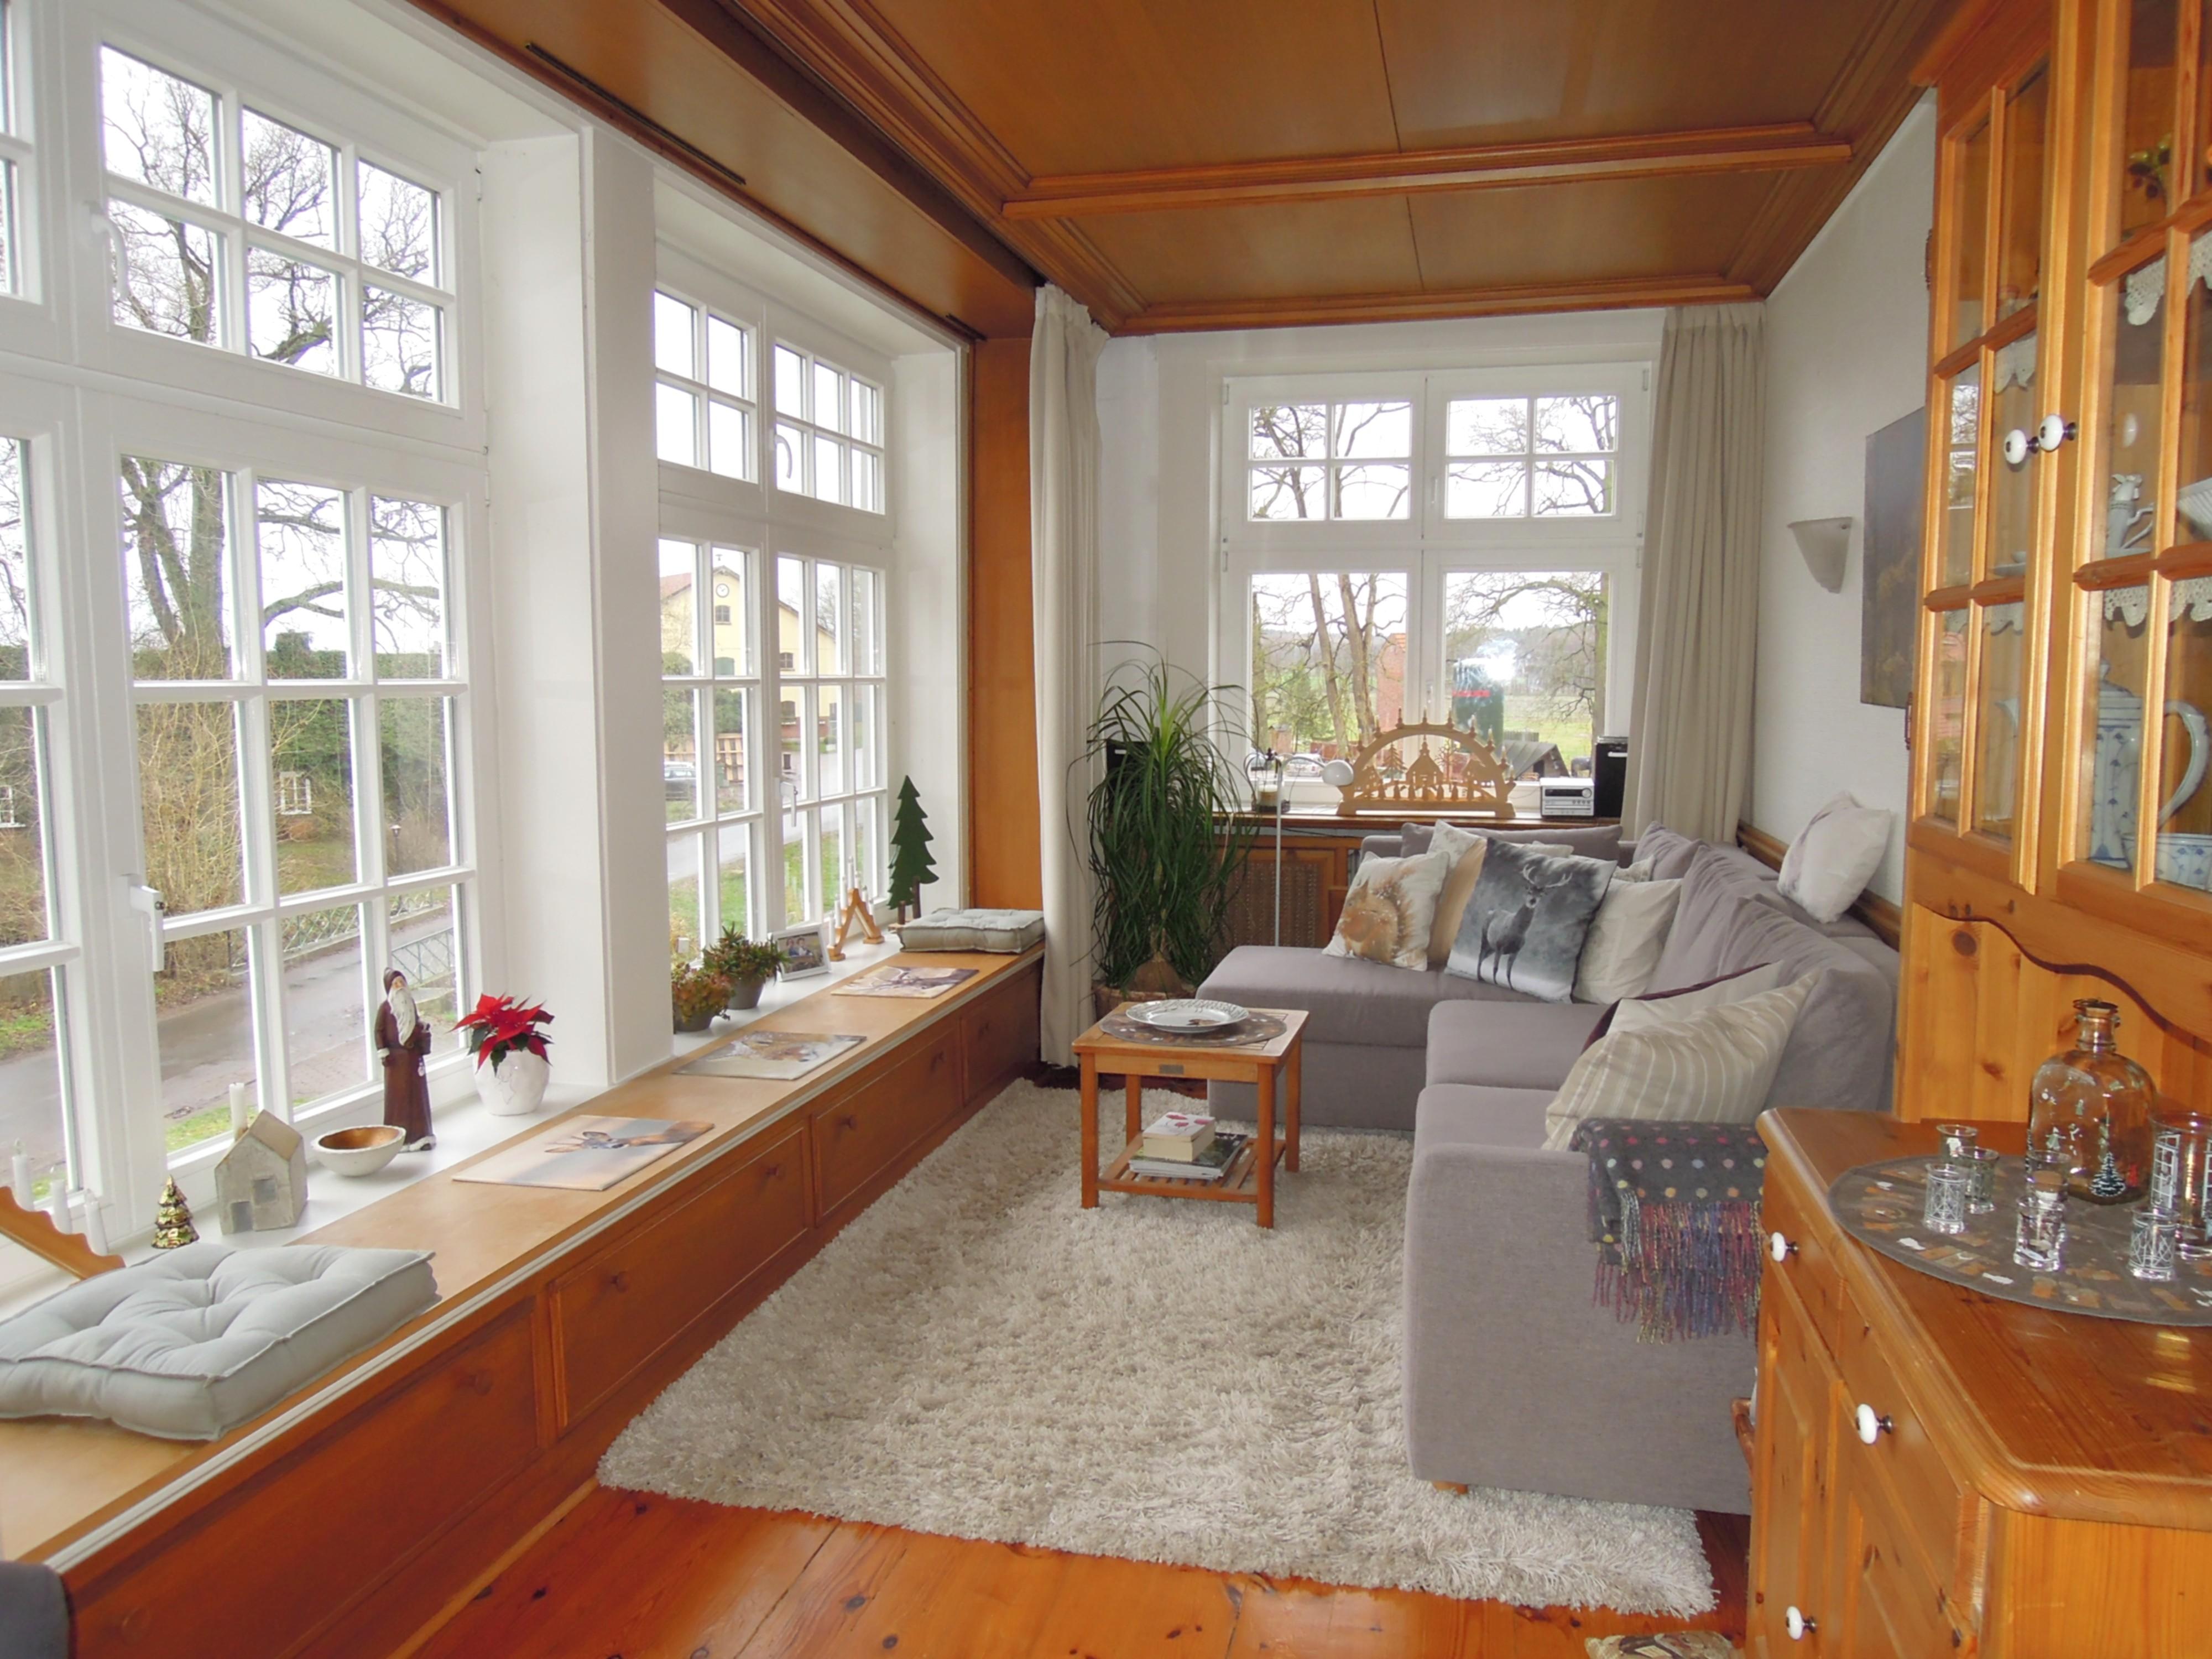 charmante 3 zi whg mit kamin wintergarten bei. Black Bedroom Furniture Sets. Home Design Ideas